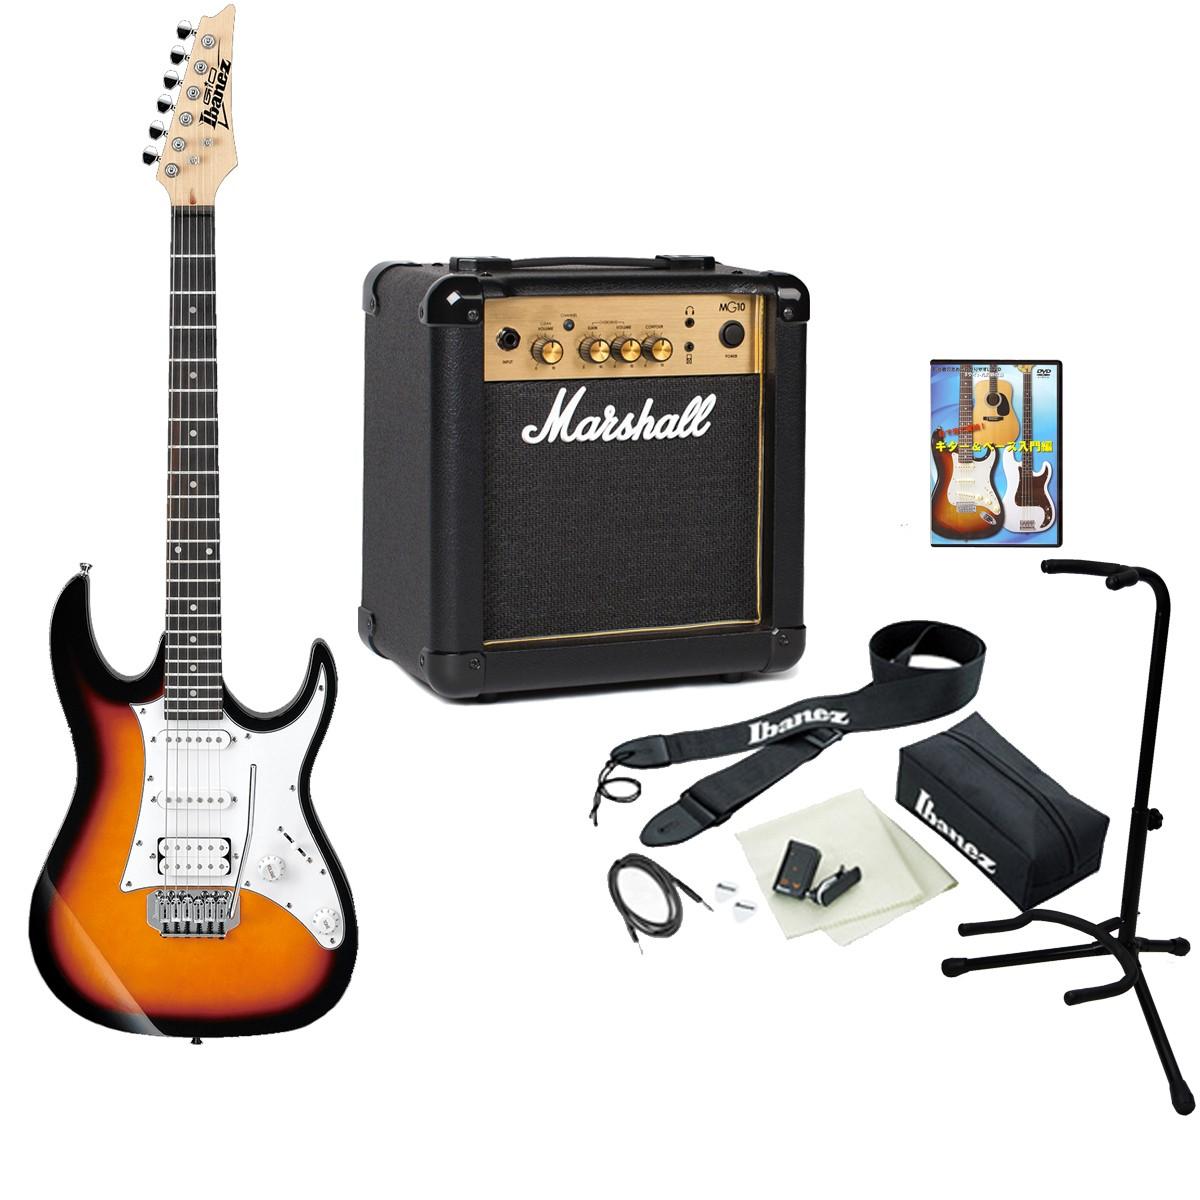 Ibanez アイバニーズ / GIO GRX40 TFB + MG10 【Ibanez × Marshall ロックギタースタートセット!】【10Wアンプ付きセット】